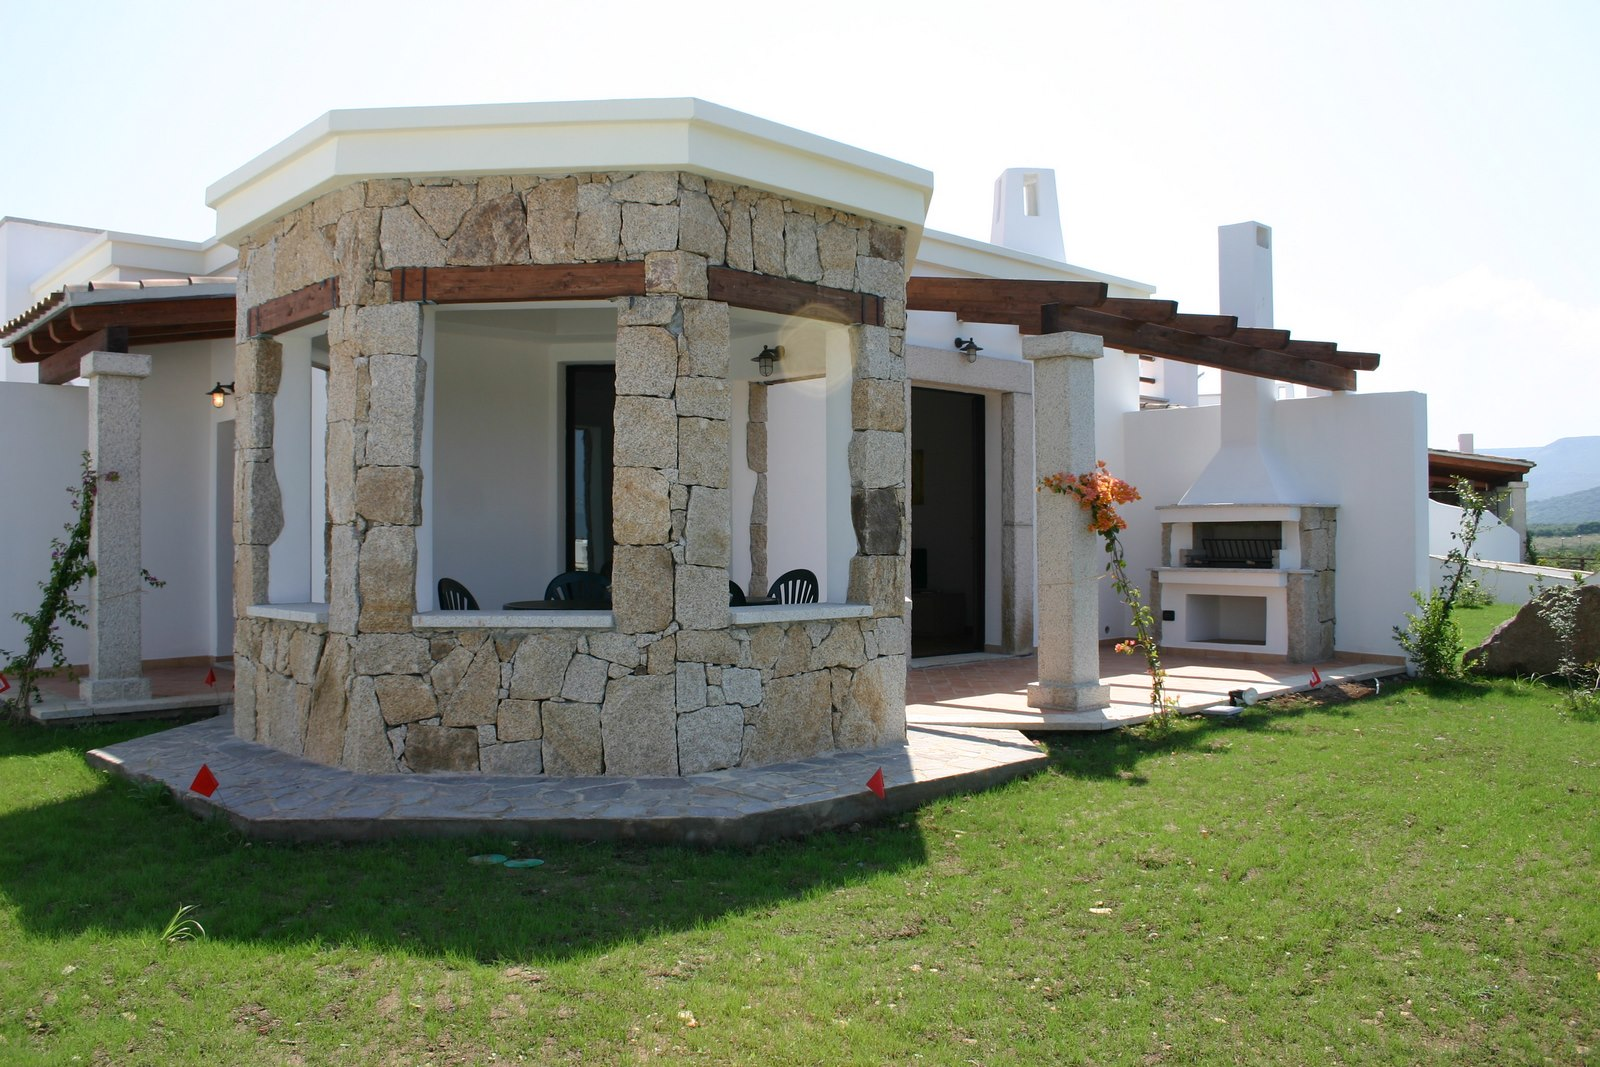 Ferienhaus Carru (877335), Sant Angelo Custode, Sassari, Sardinien, Italien, Bild 18